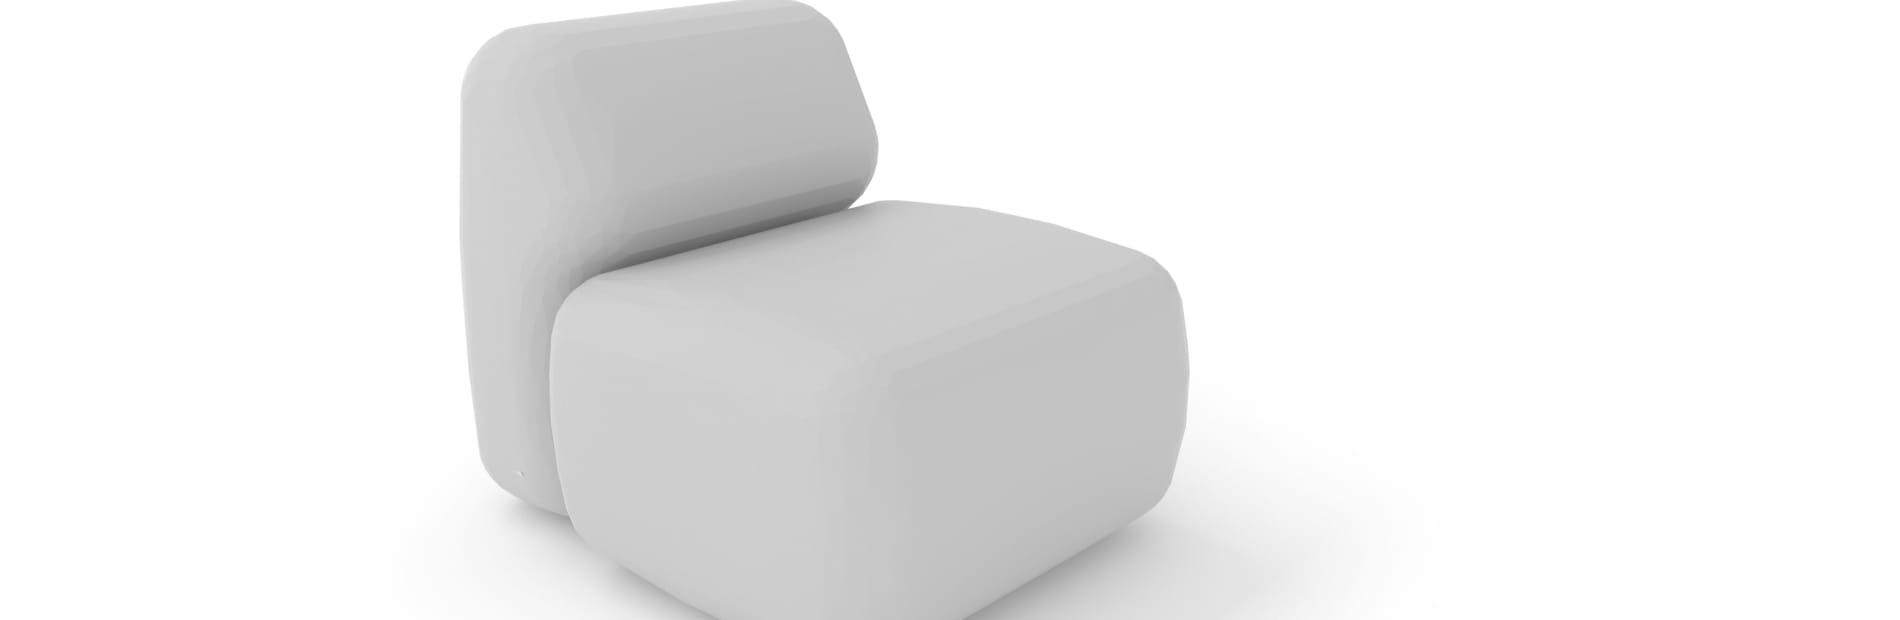 escofet sit concrete seat